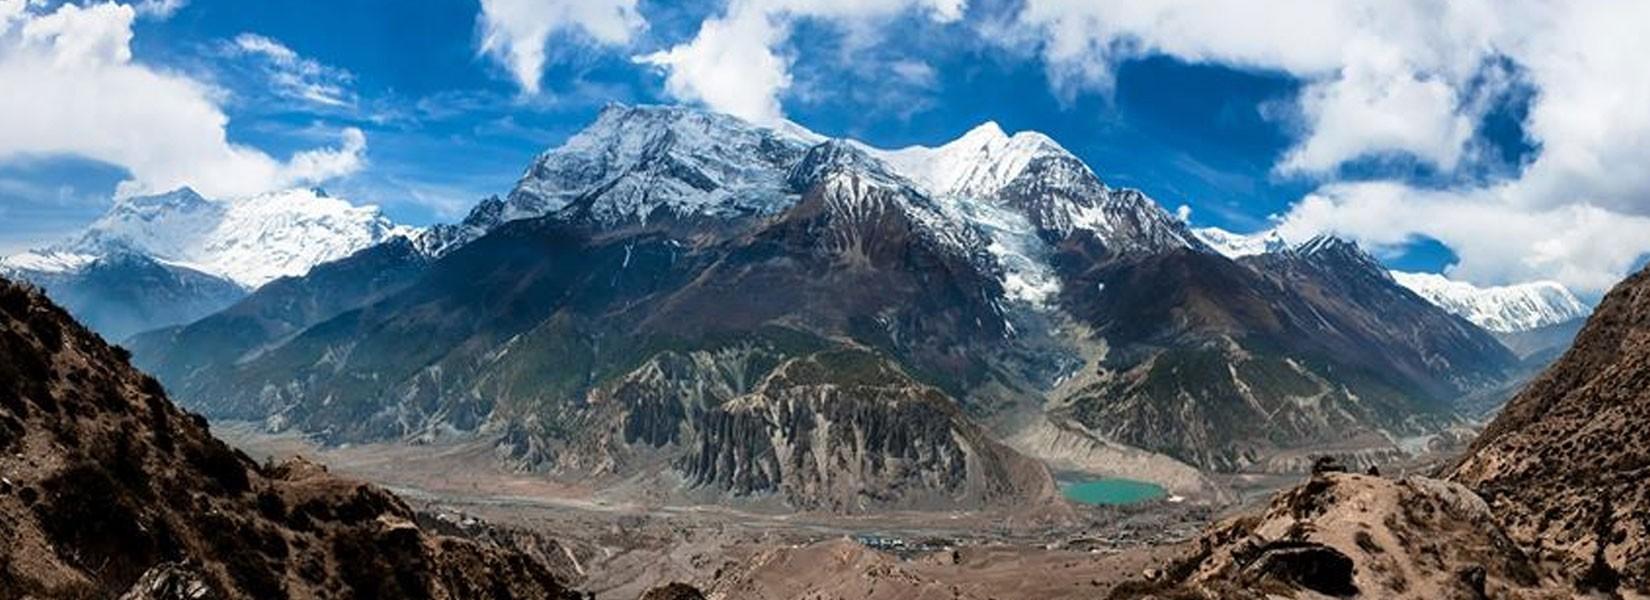 Annapurna Himalaya Range